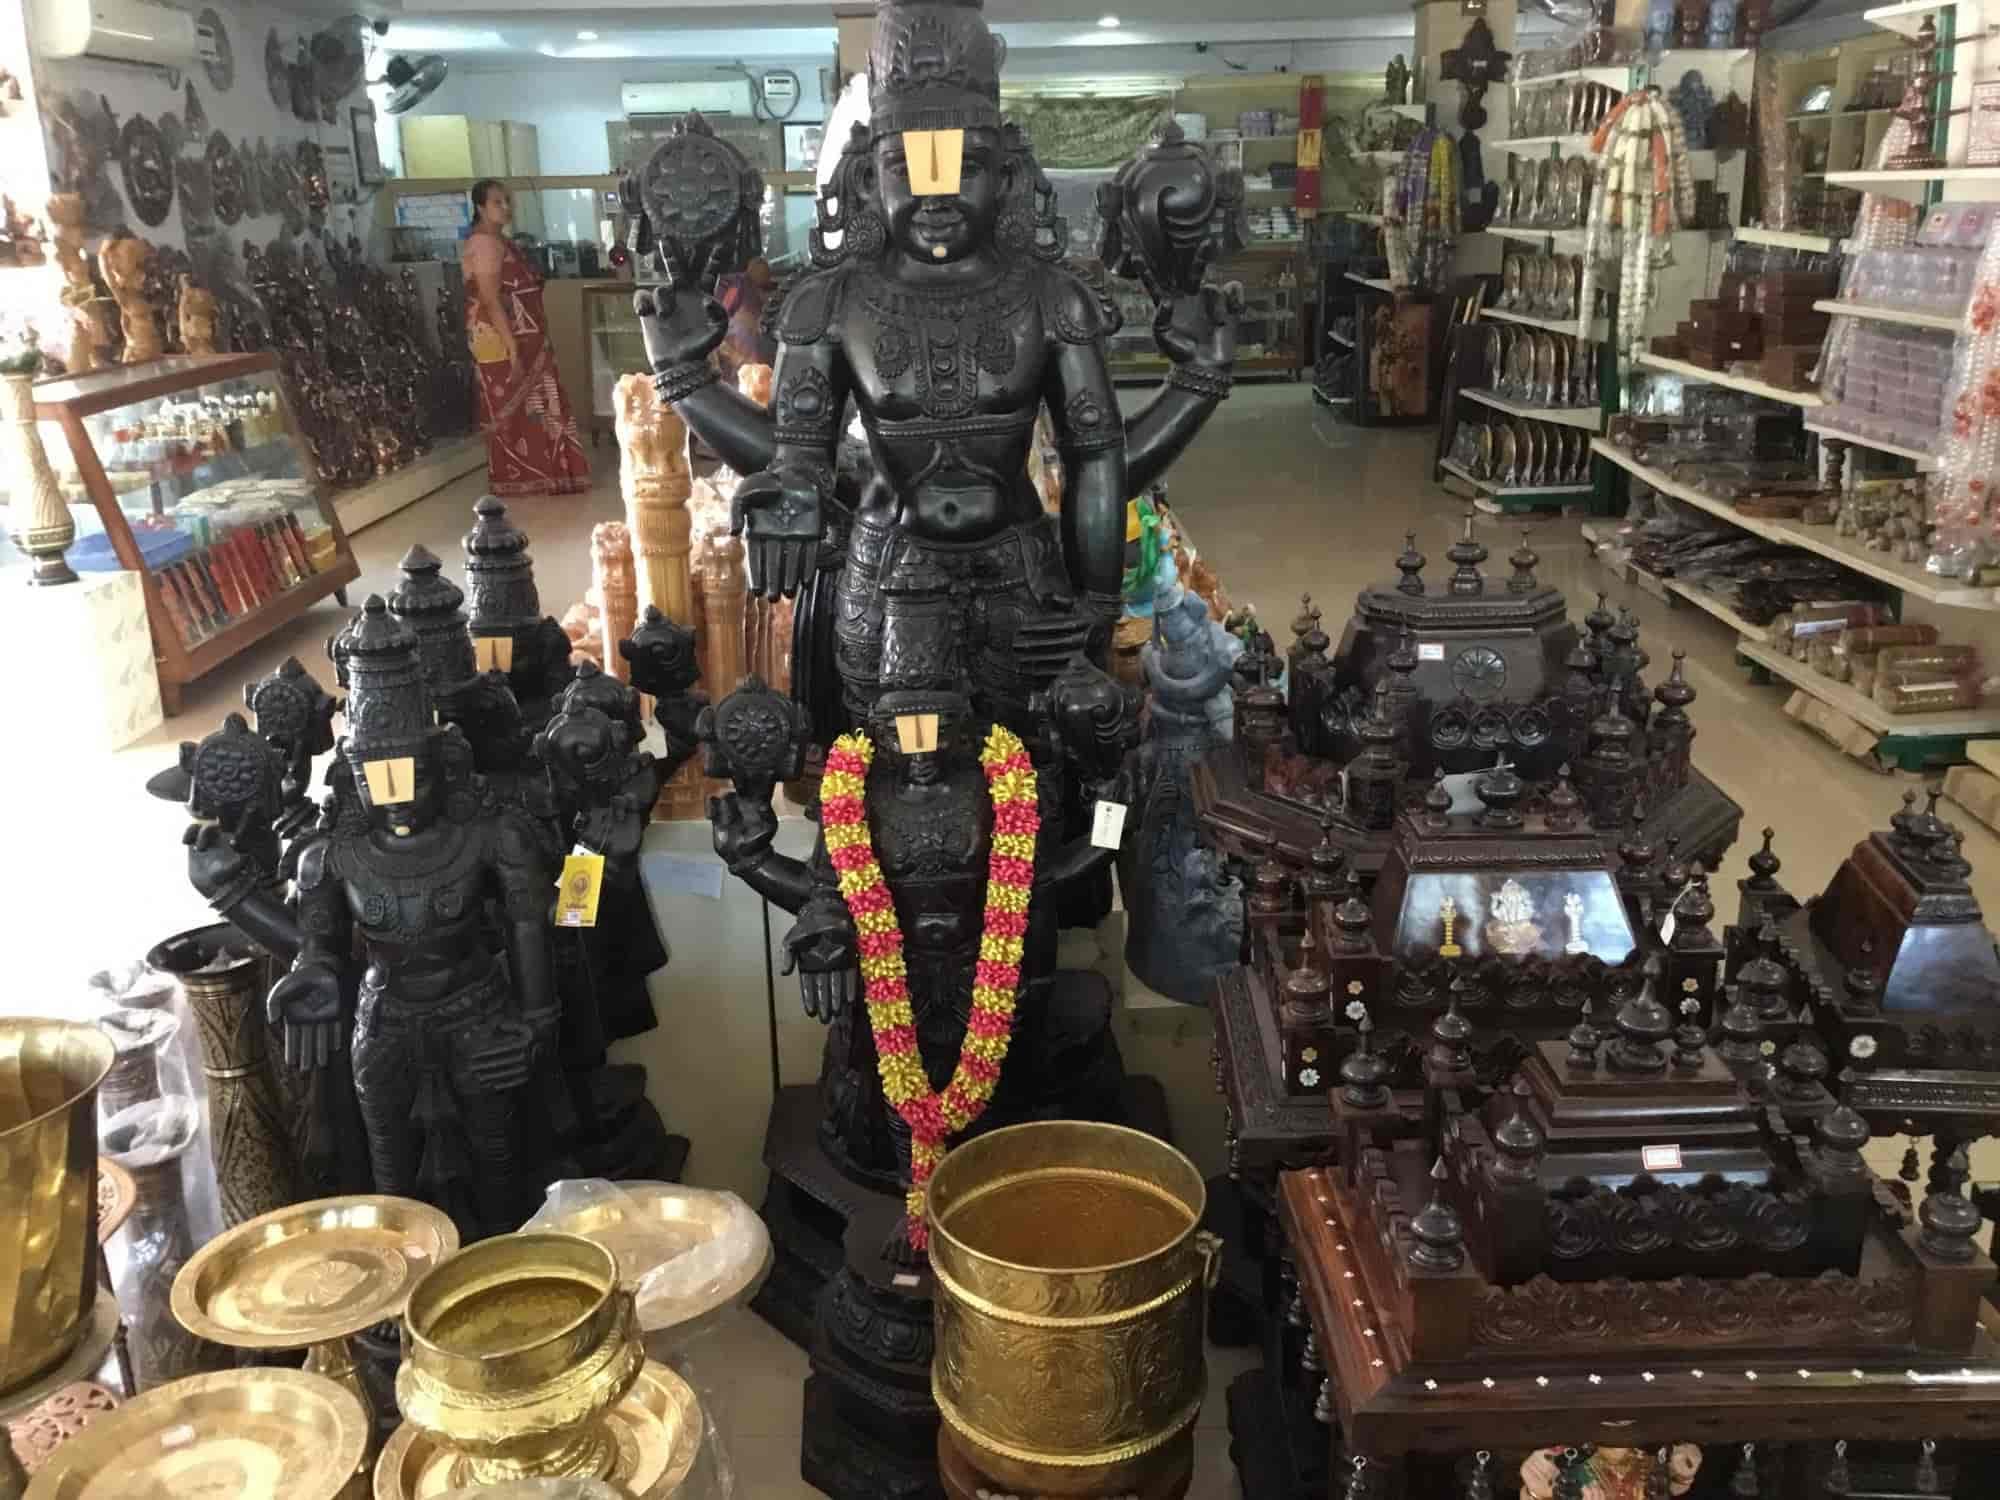 Lepakshi Craft Emporium, Rajahmundry Ho - Gift Shops in Rajahmundry -  Justdial